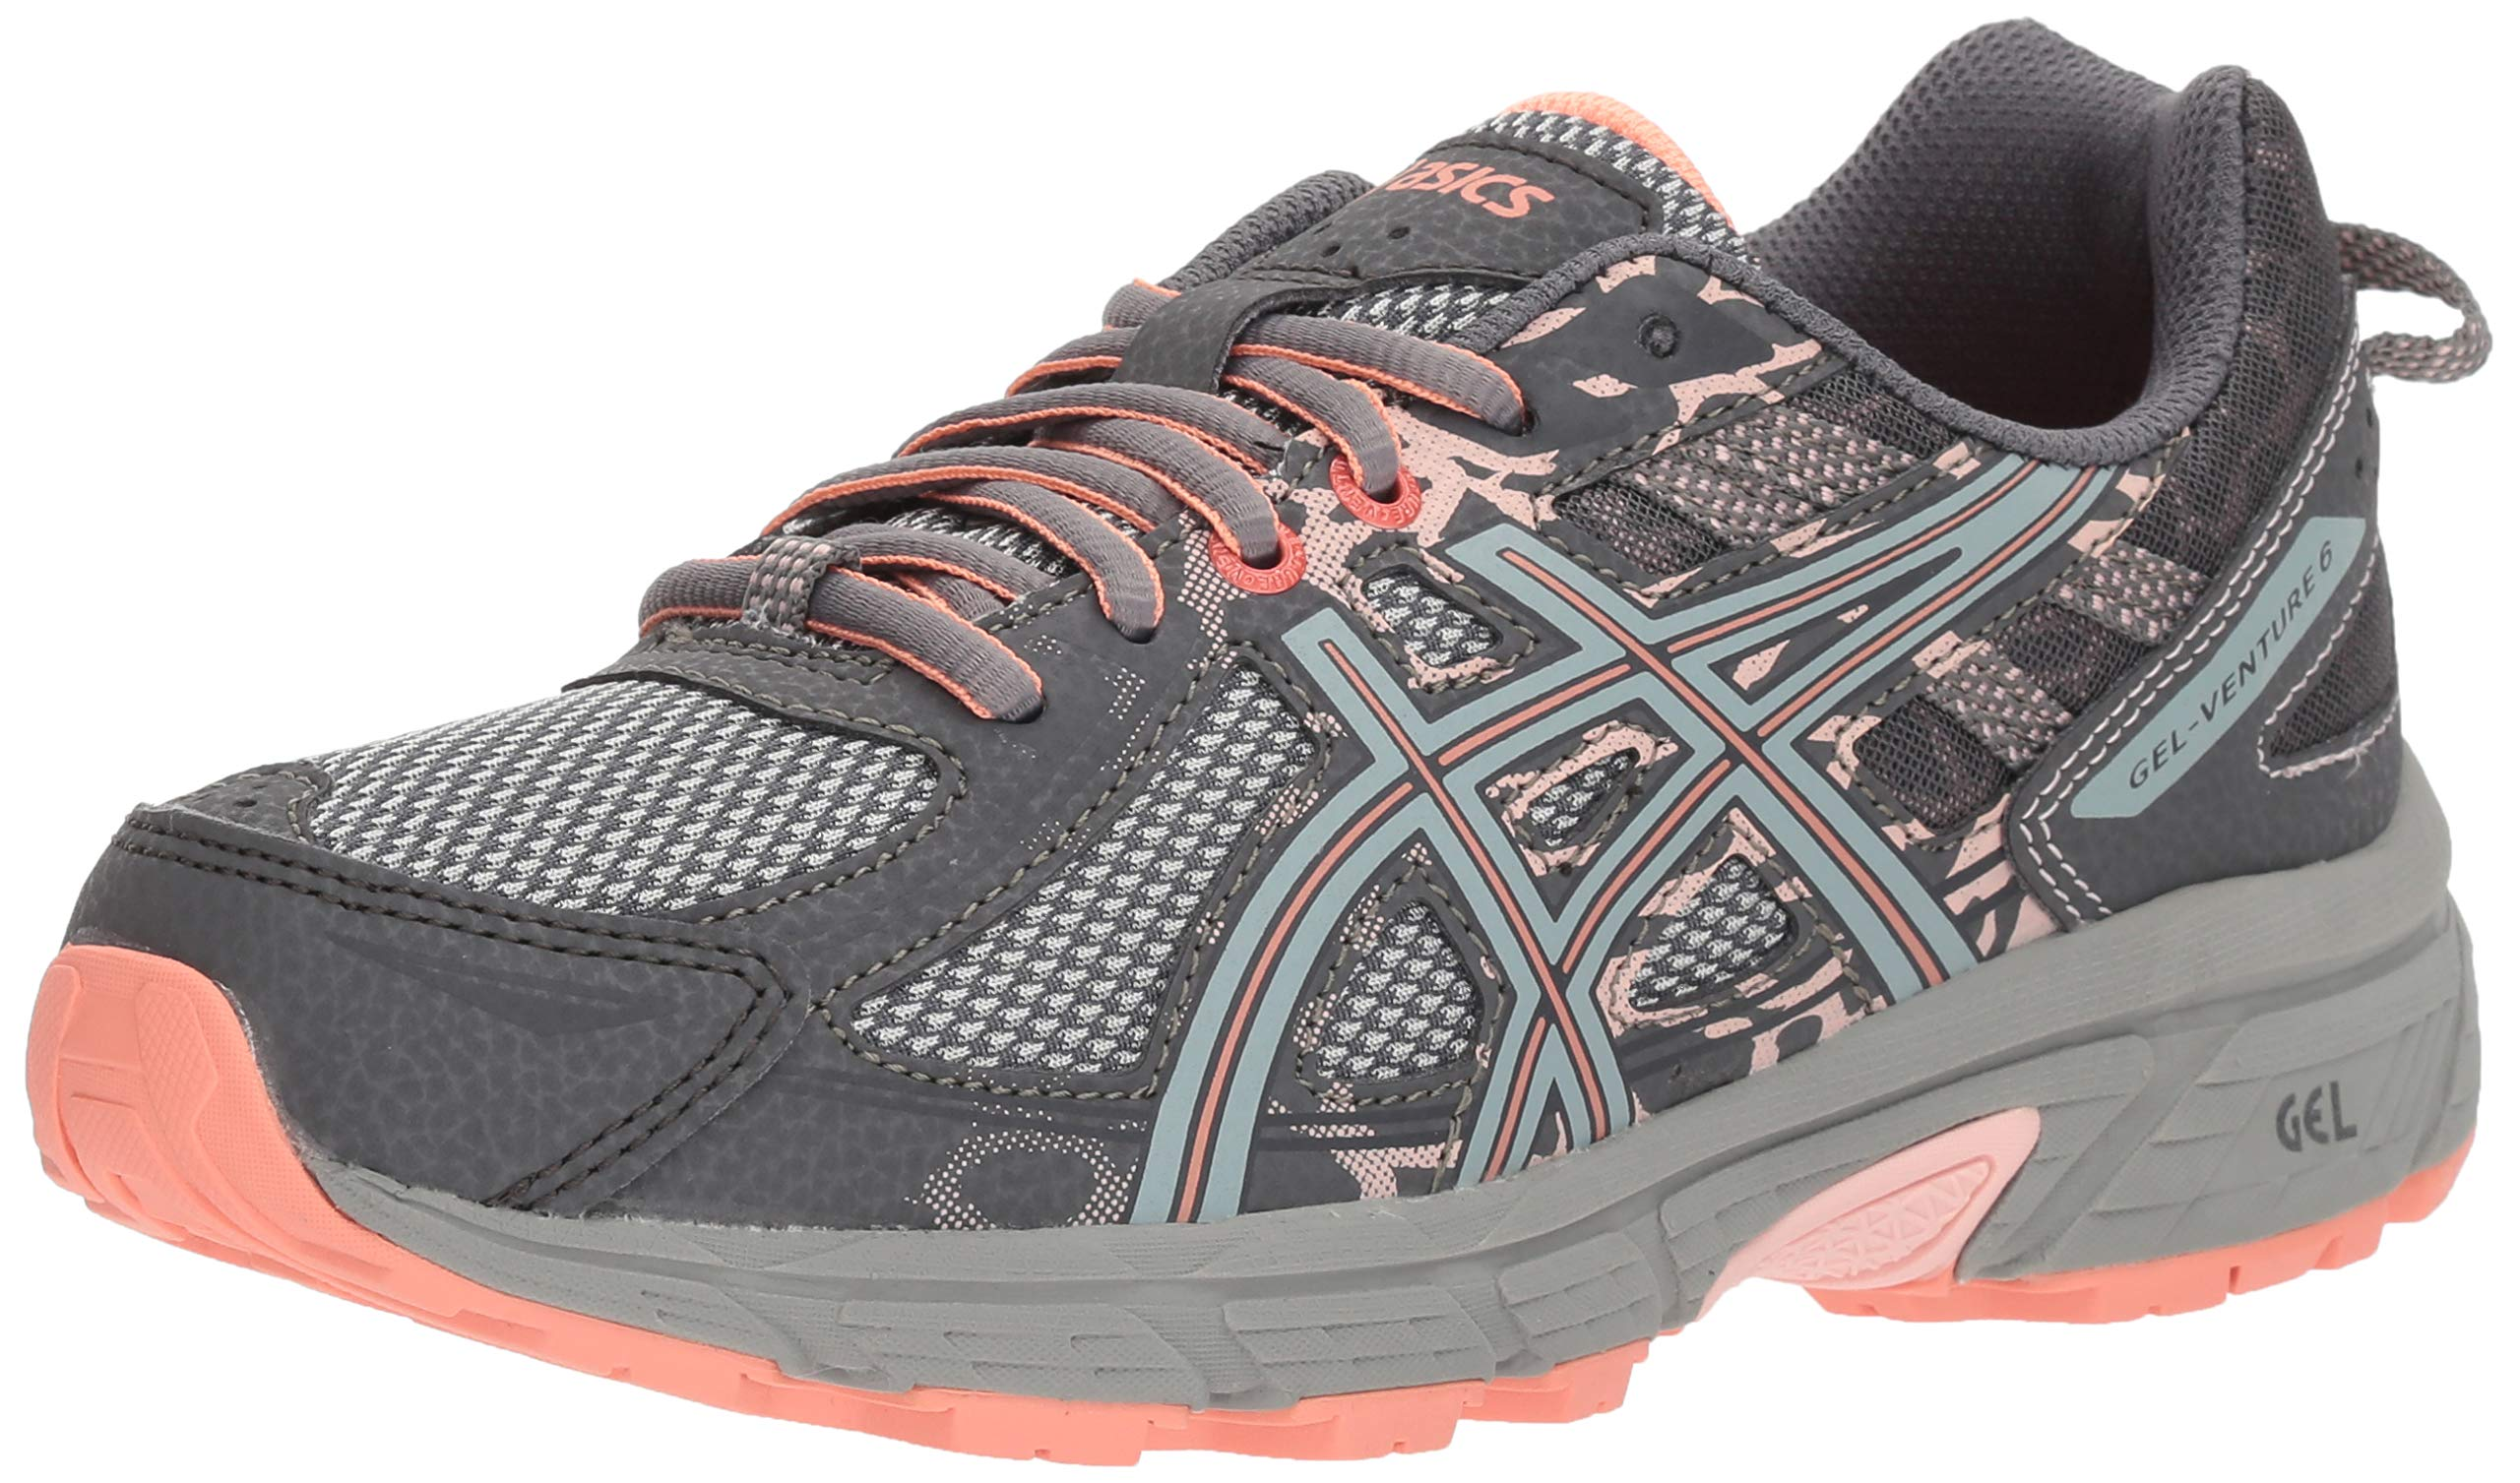 ASICS Gel-Venture 6 Women's Running Shoe, Carbon/Mid Grey/Seashell Pink, 7.5 M US by ASICS